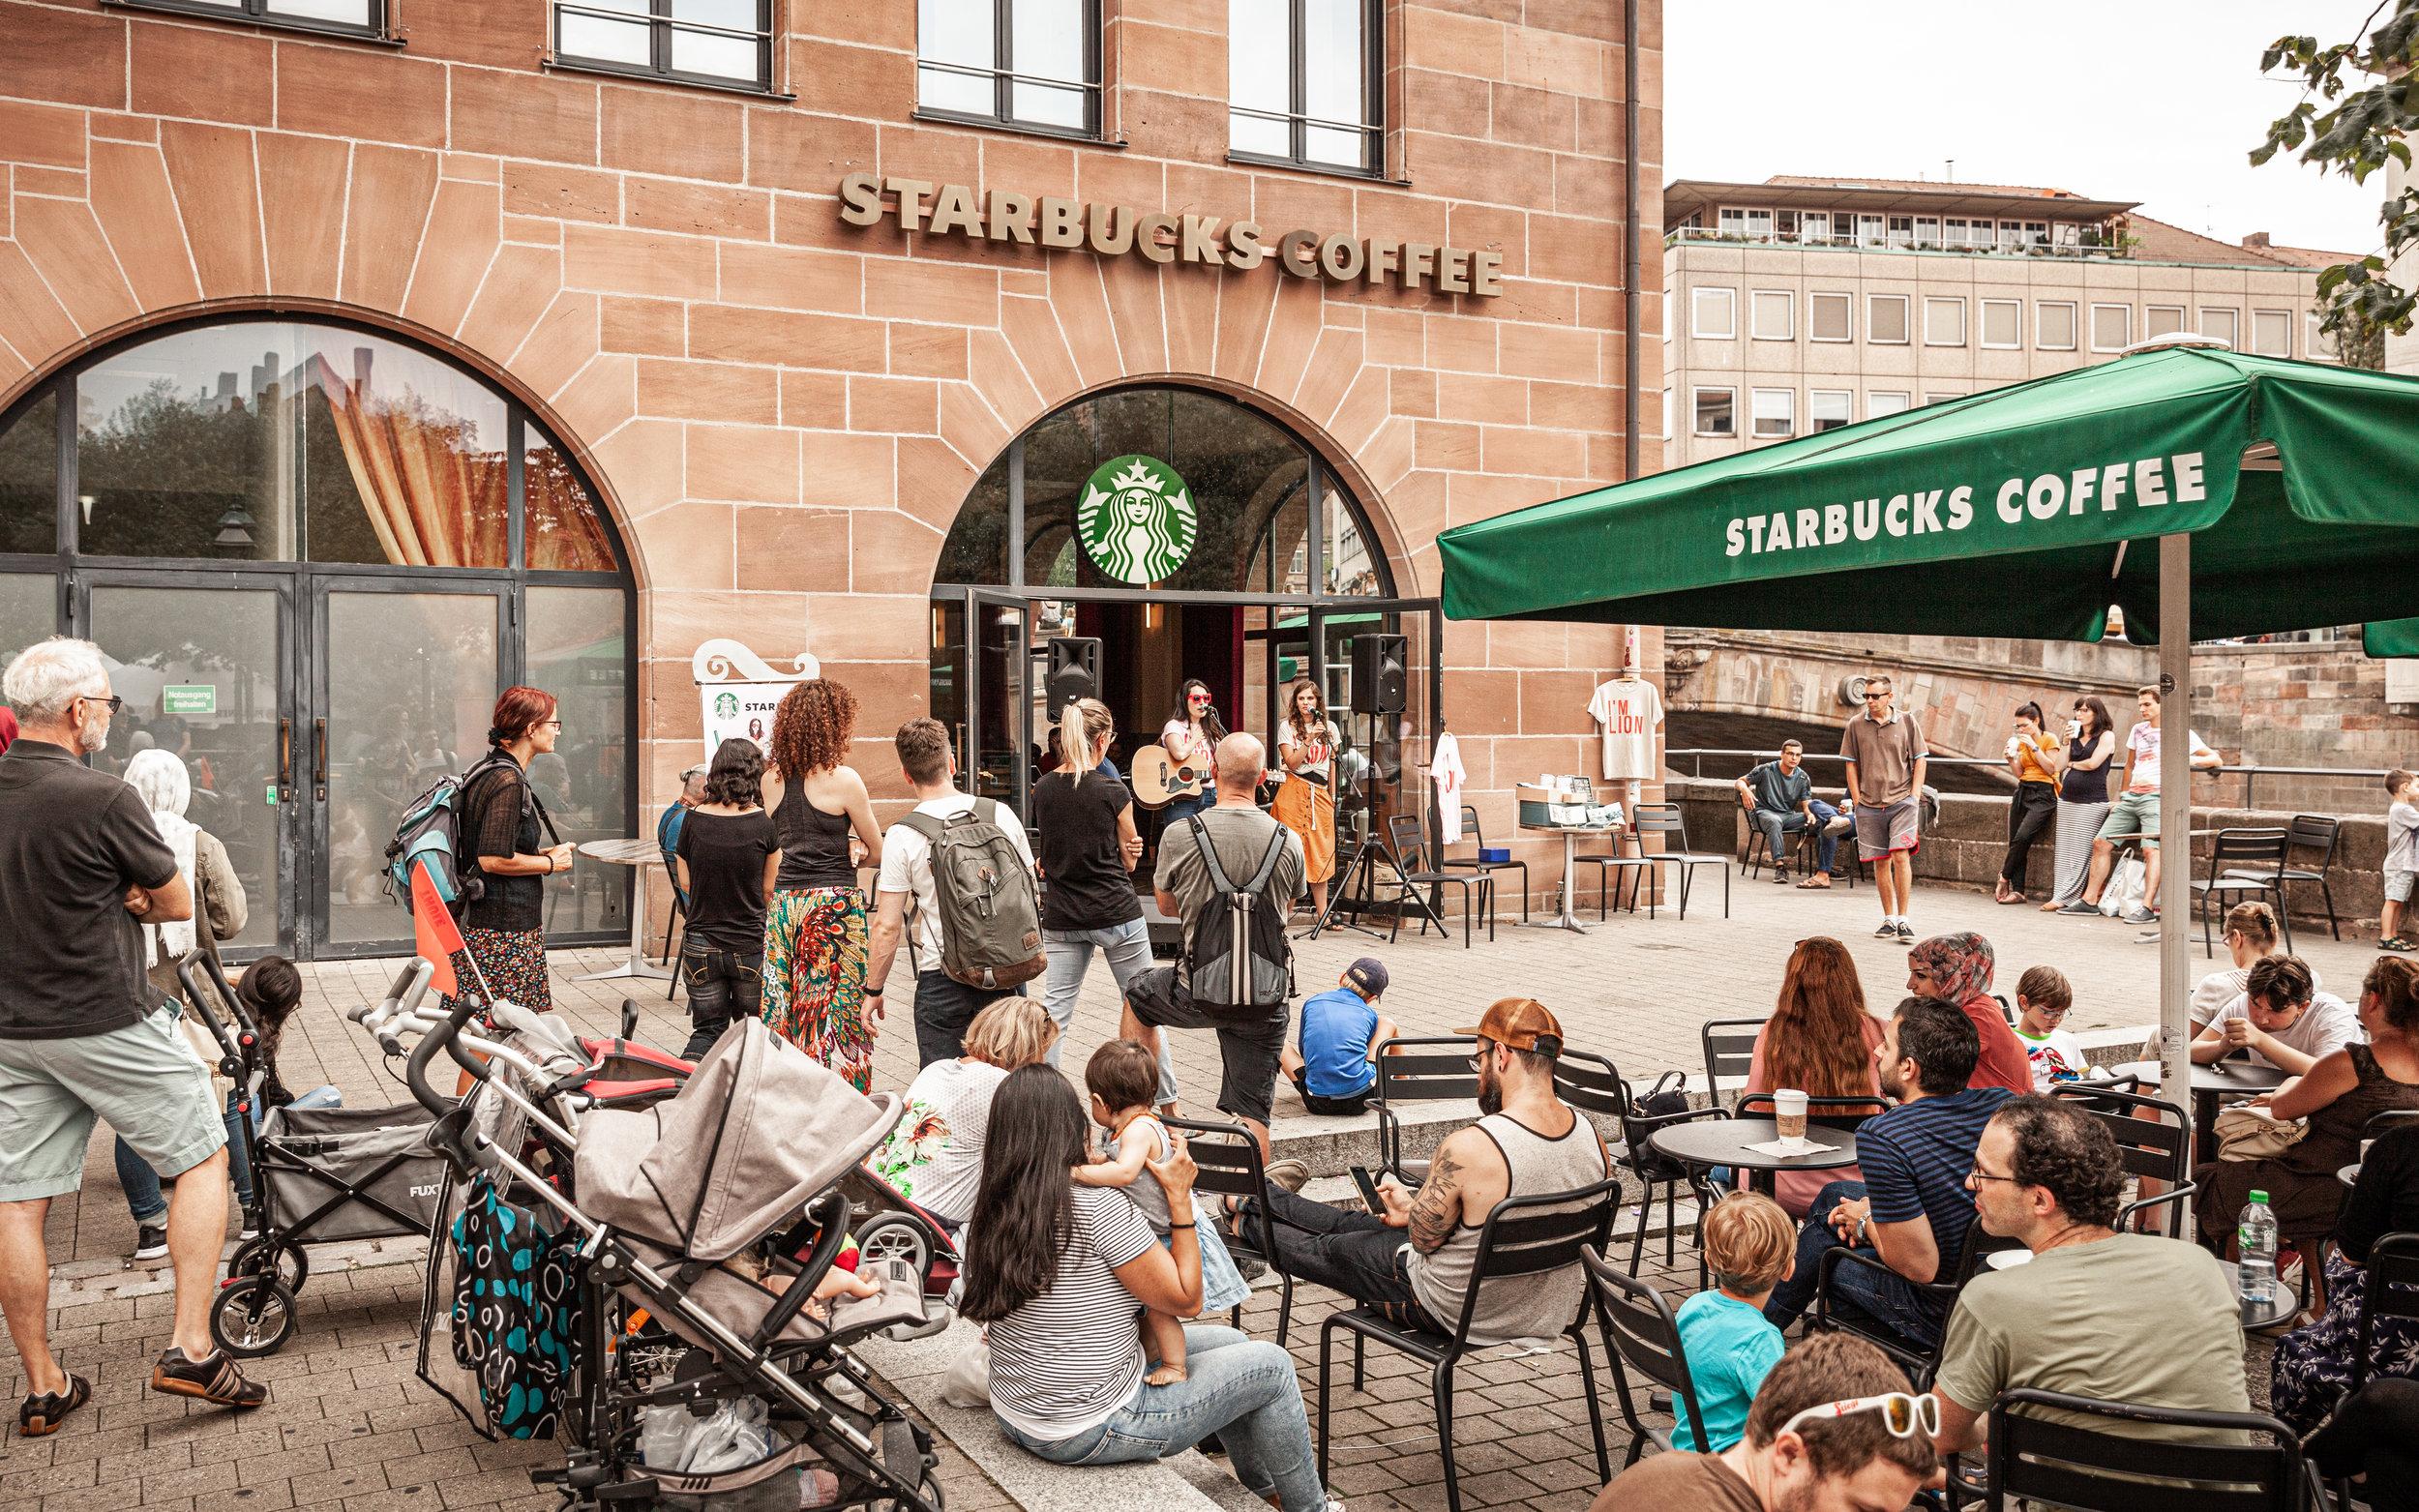 Liz_x_Starbucks_Bardentreffen_2019_High_Res-29.jpg